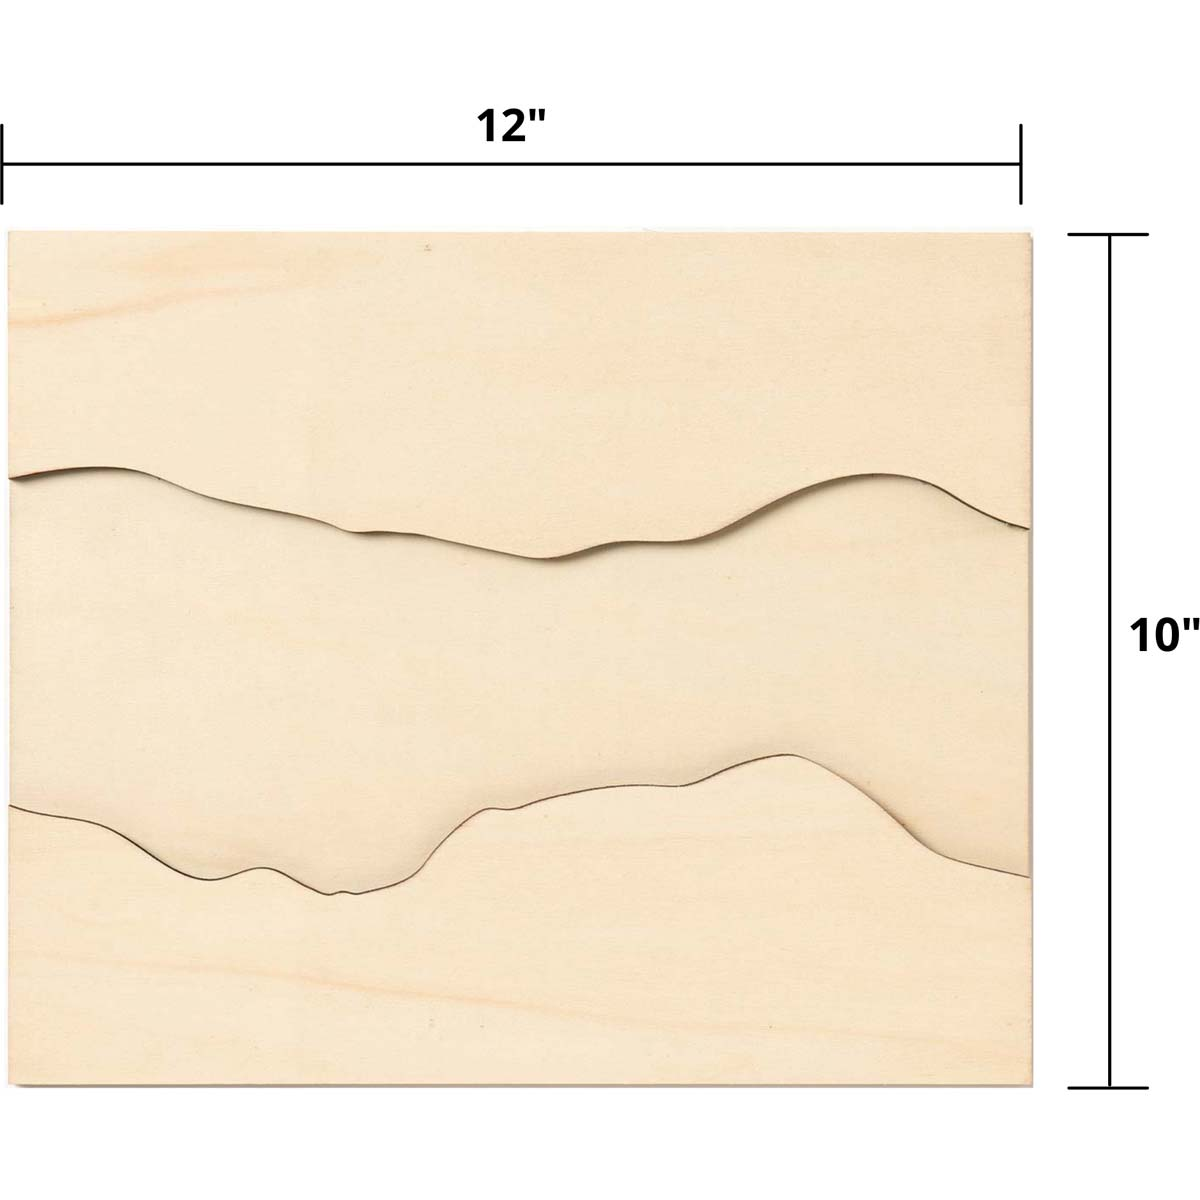 Mod Podge ® Resin Pouring Surface - River Plaque - 56646E